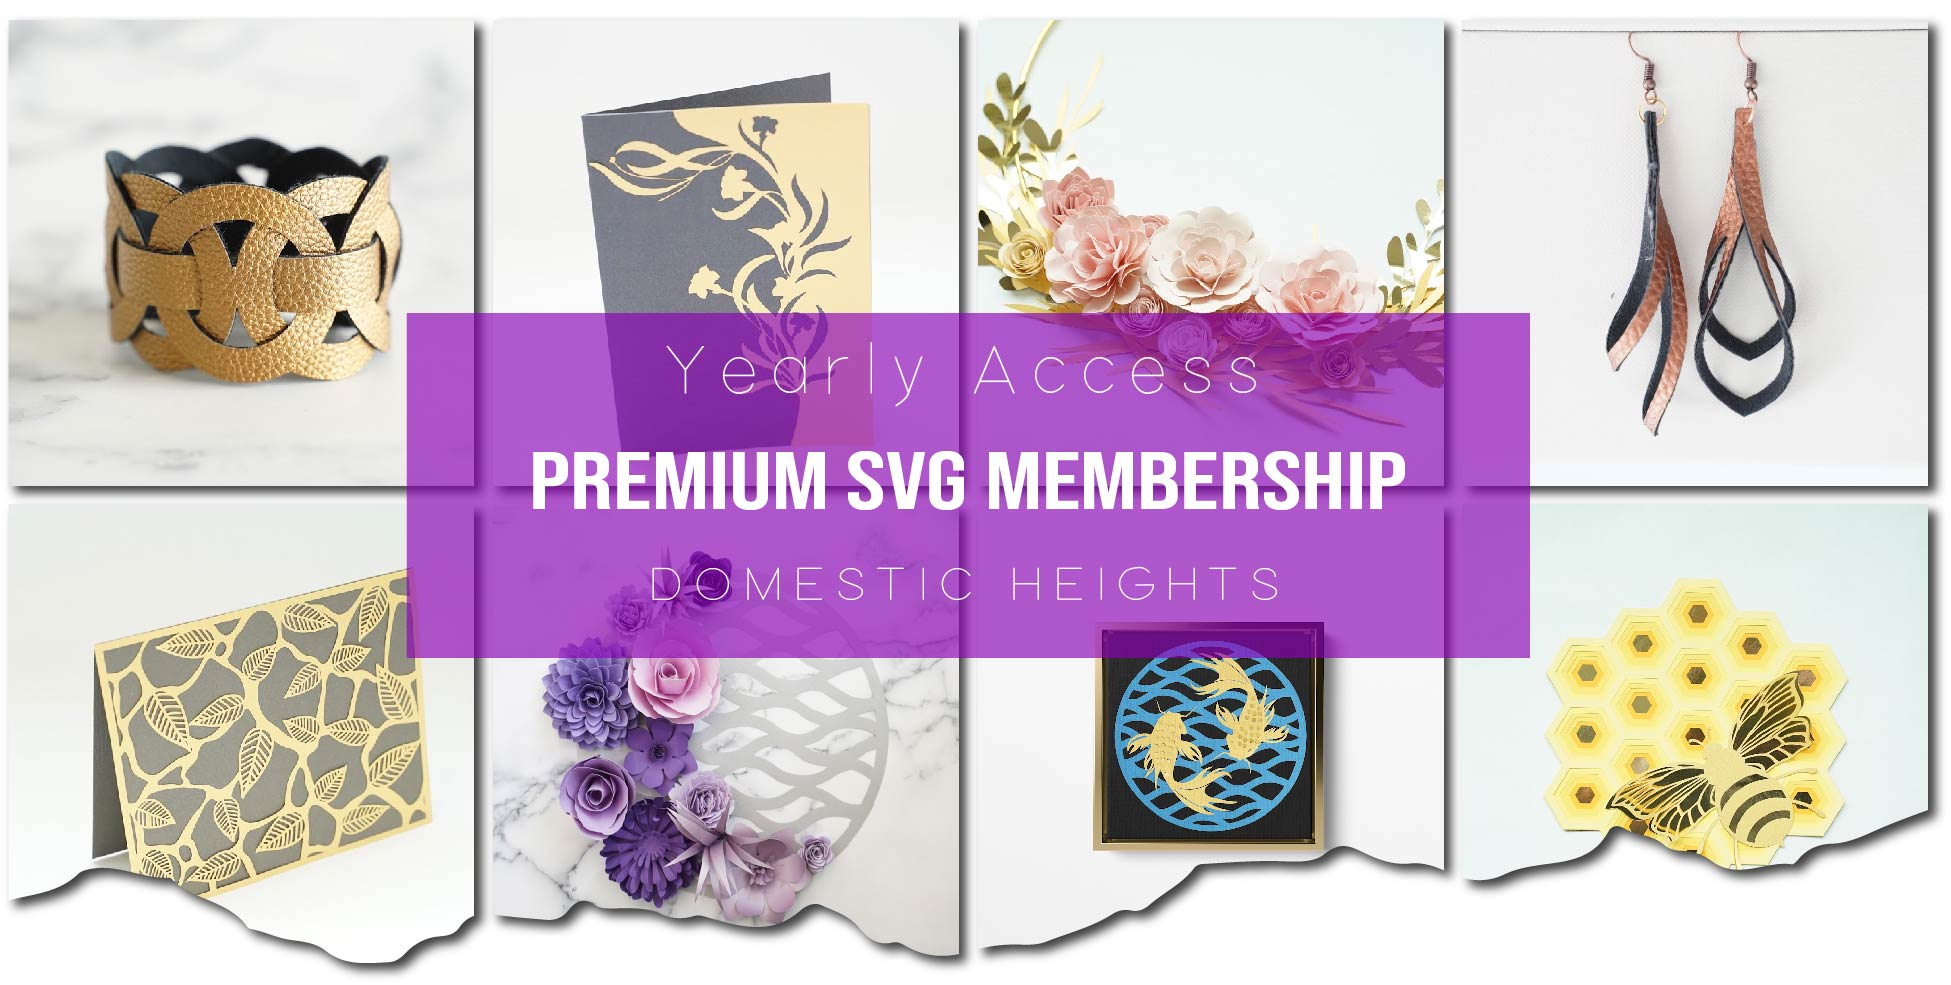 SVG Membership Header collage